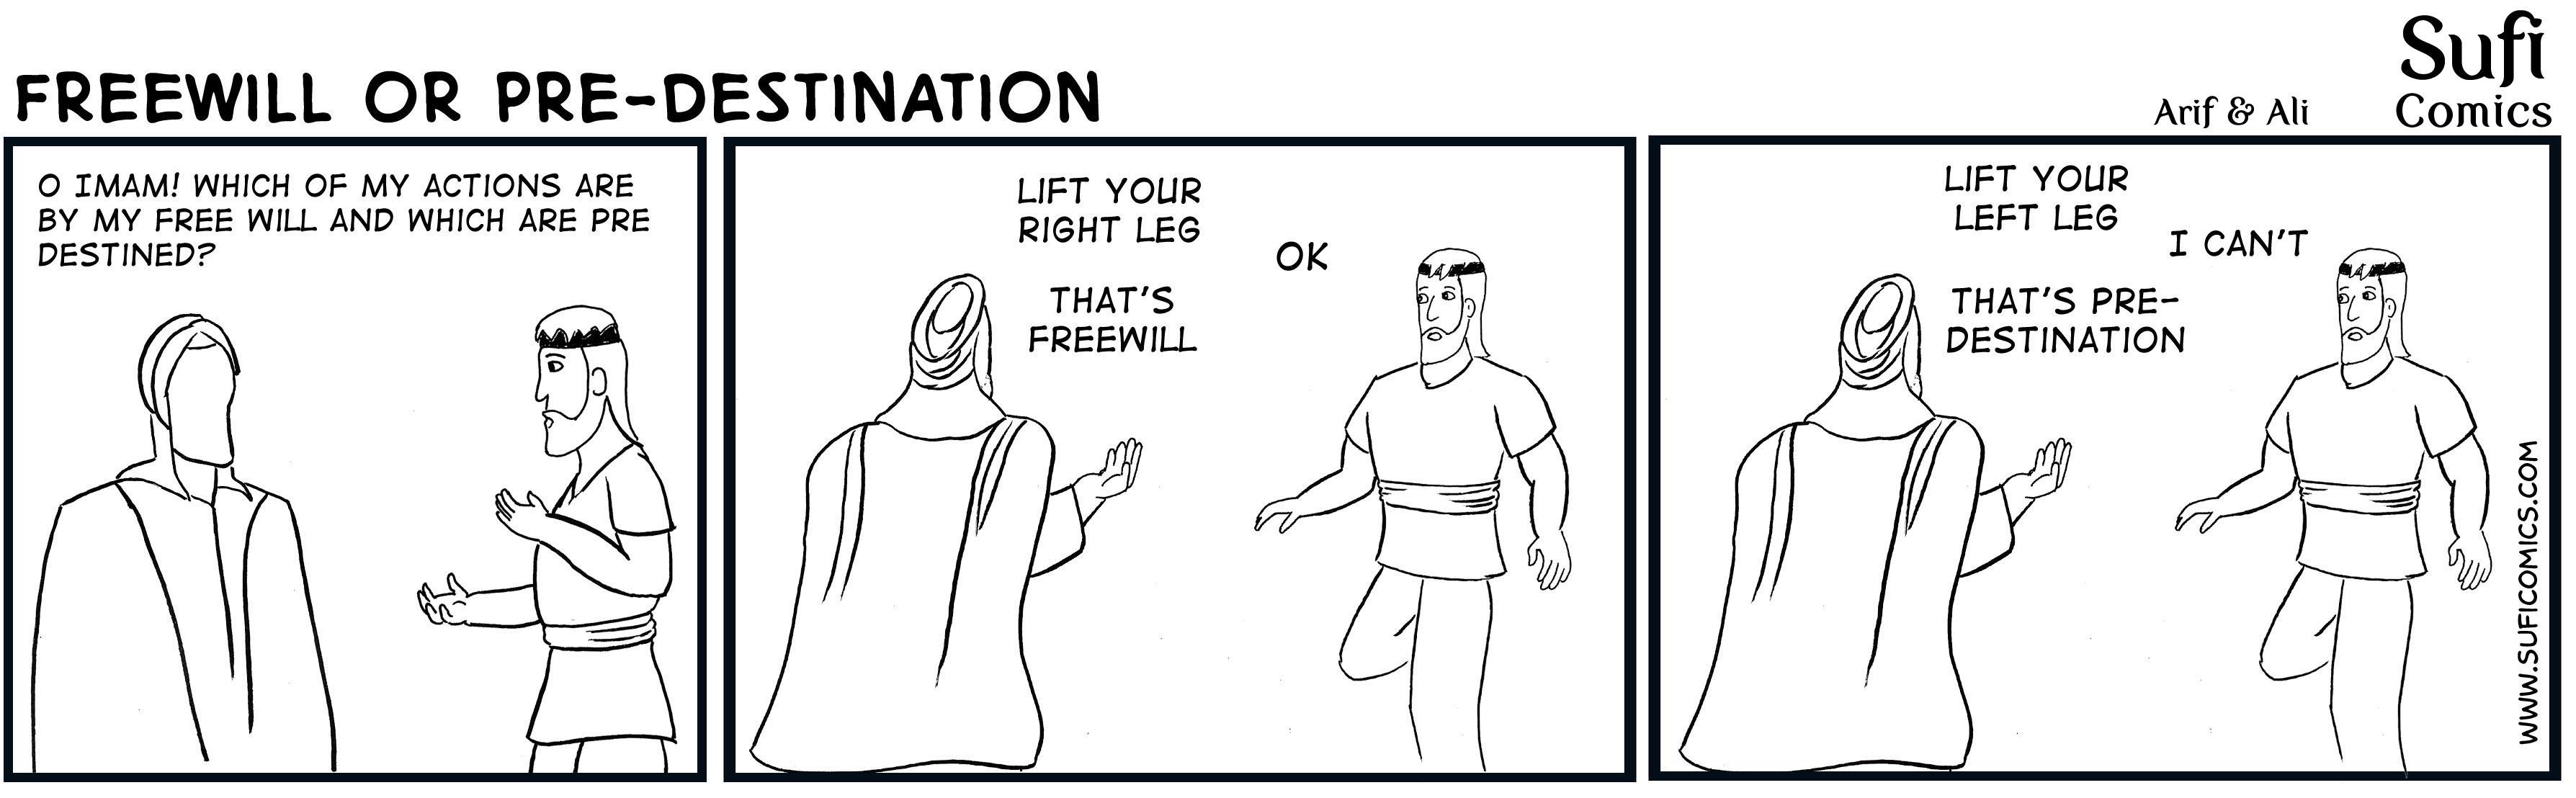 sufi-comics-freewill-or-predestination[1].jpg